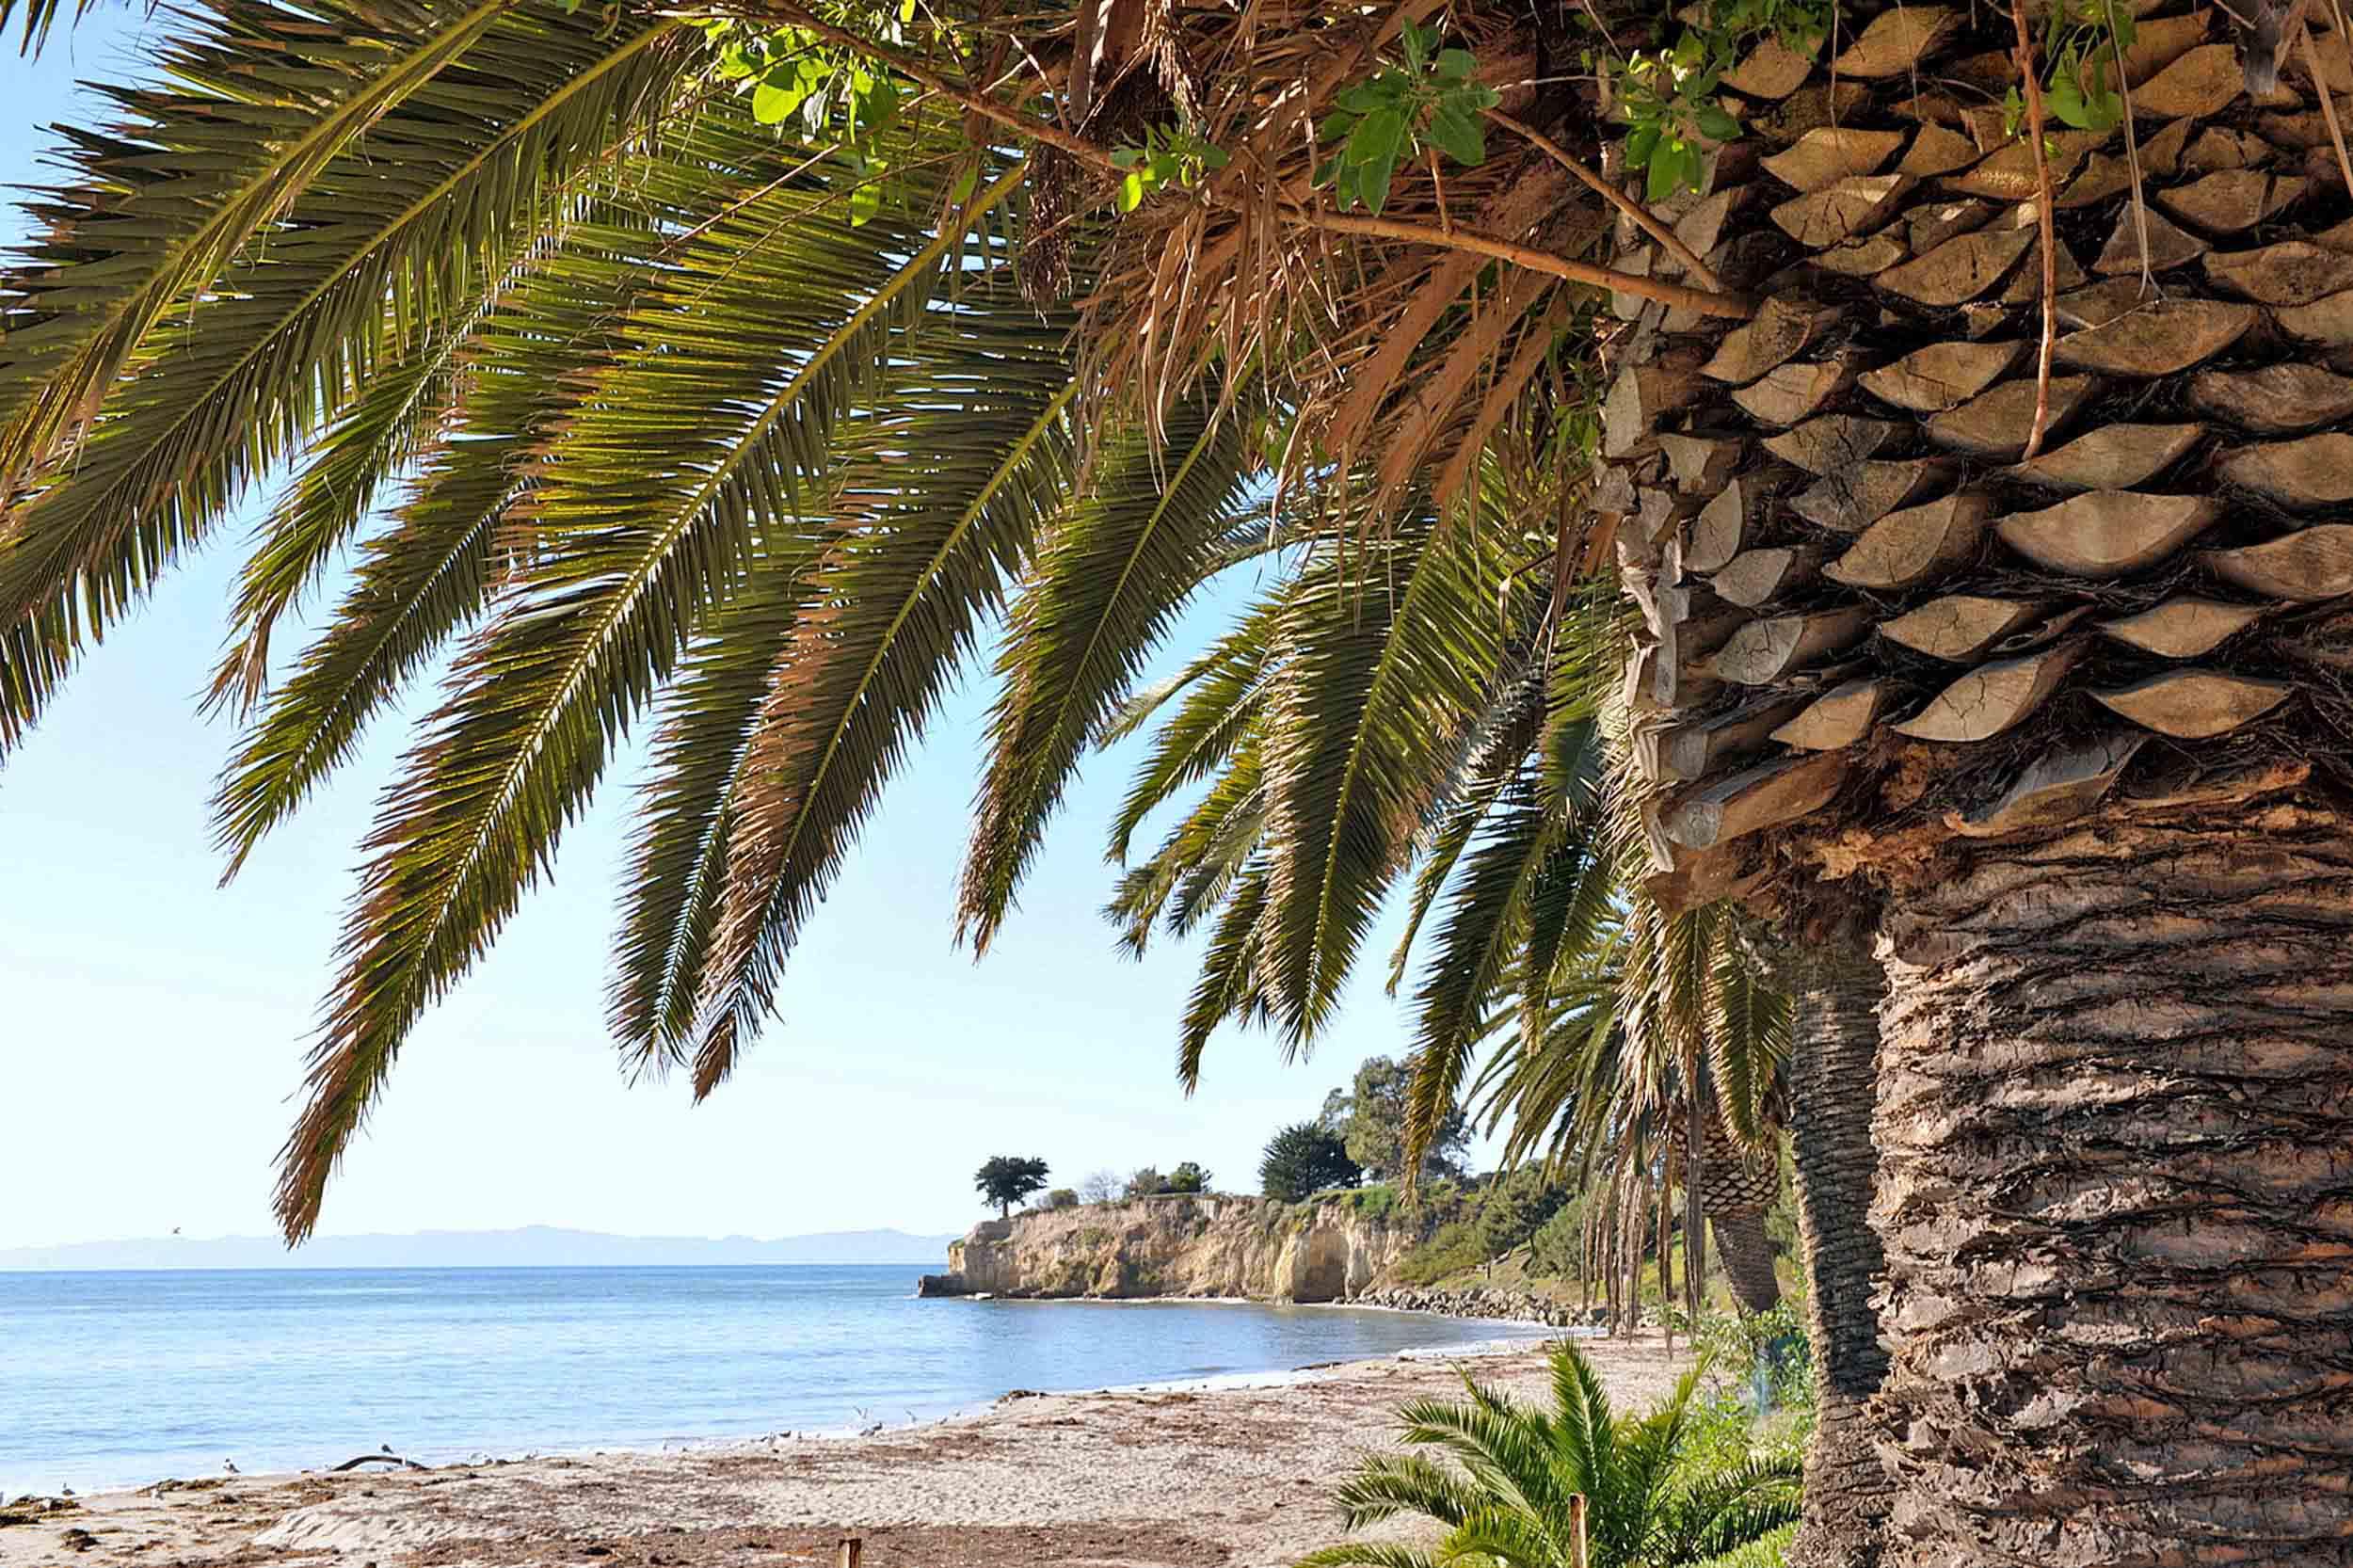 Santa Barbara Hotels >> Santa Barbara Beaches | East Beach, Butterfly Beach, Shoreline